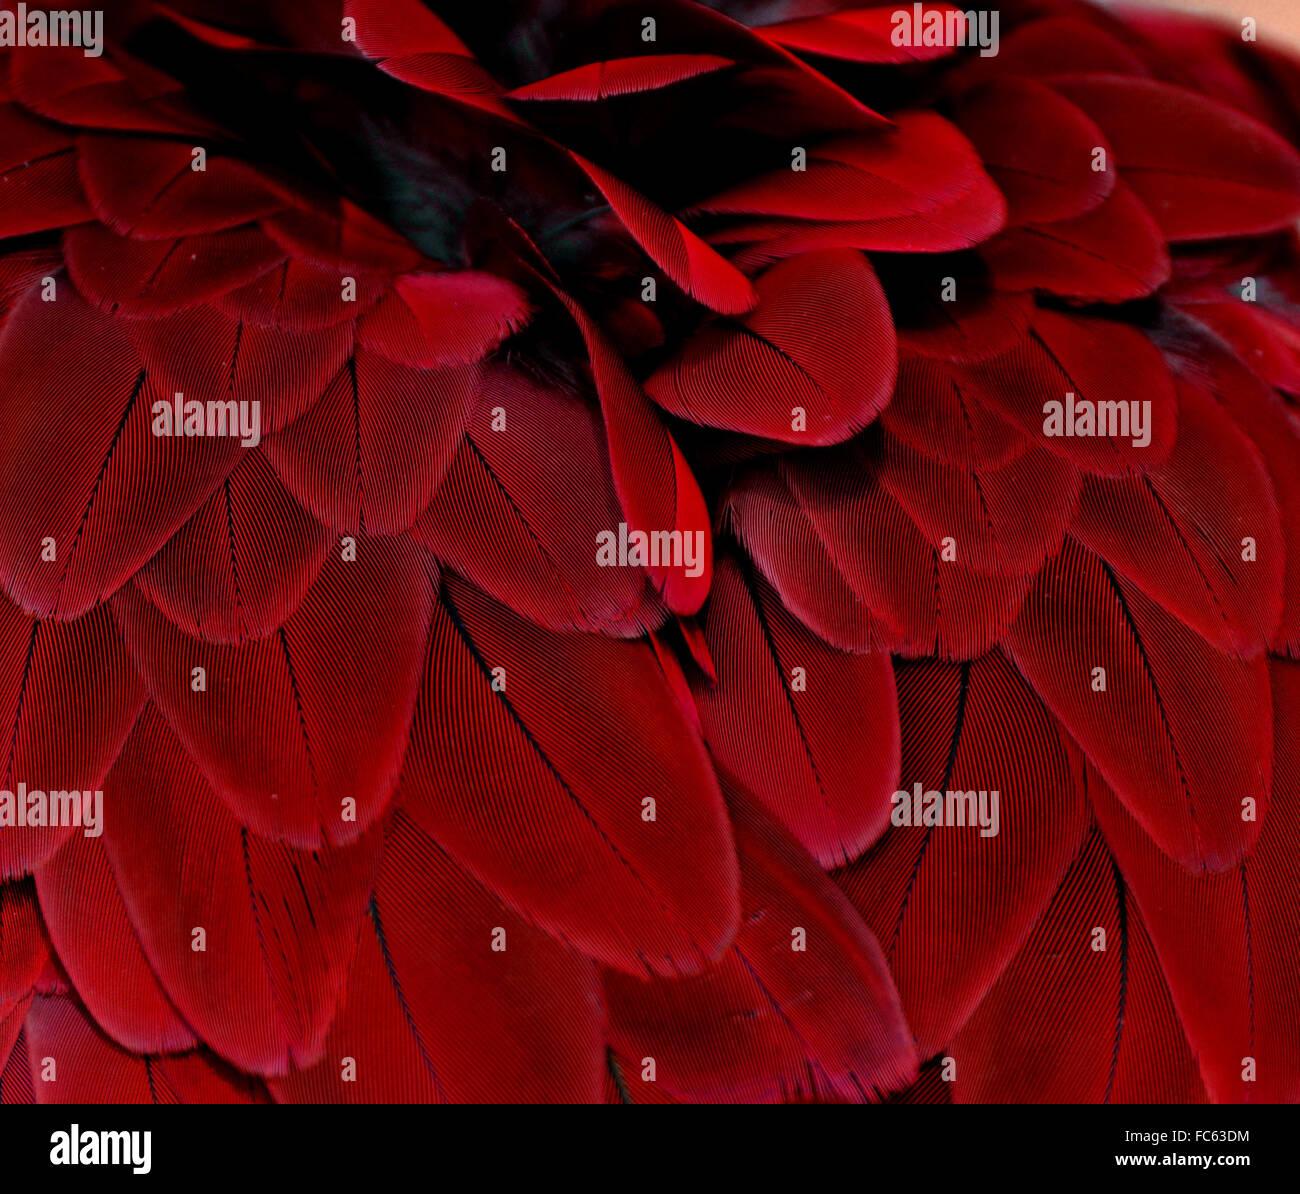 Pájaro Rojo plumas de un loro guacamayo Foto de stock